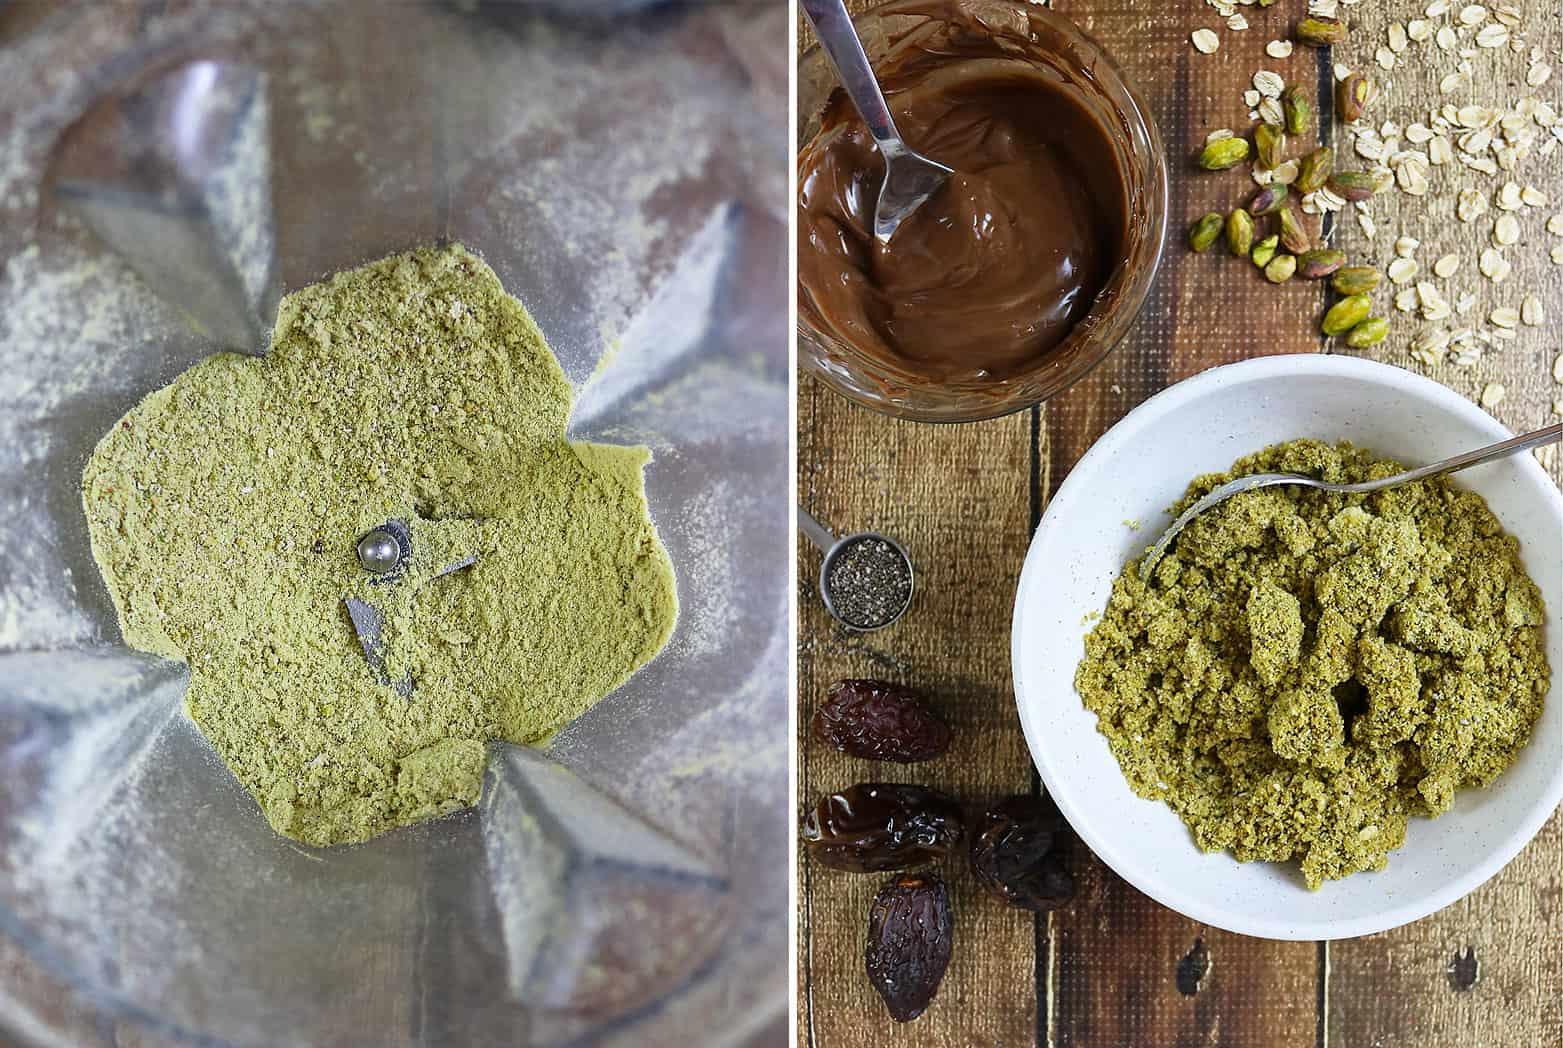 Pistachio Chocolate Bites Preparation - step 1 and step 2